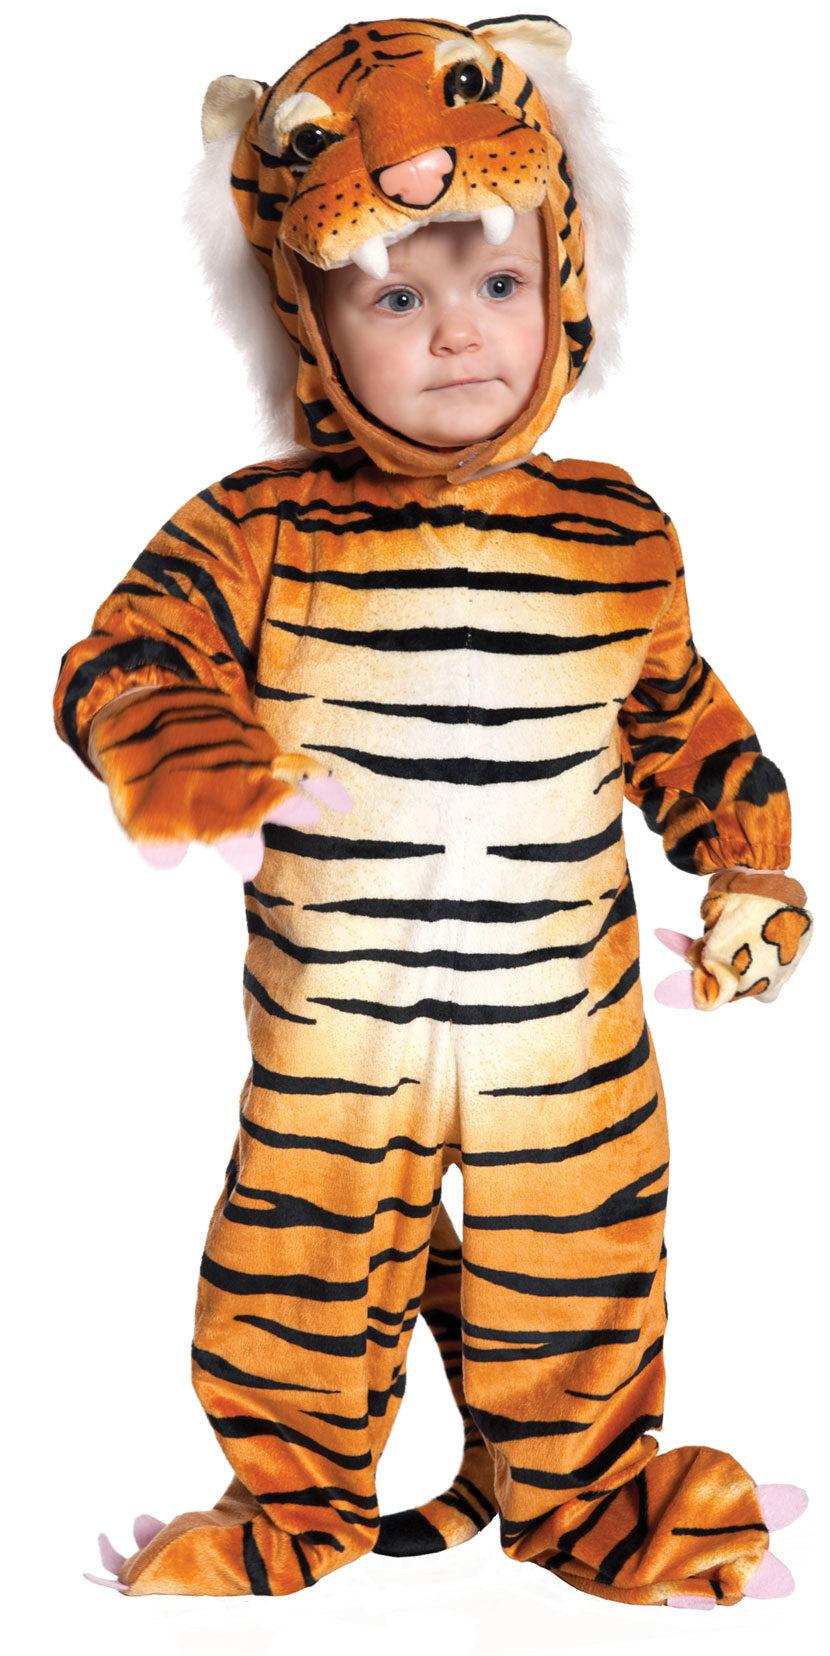 sc 1 st  Mr. Costumes & Toddler Orange Tiger Kids Costume - Mr. Costumes